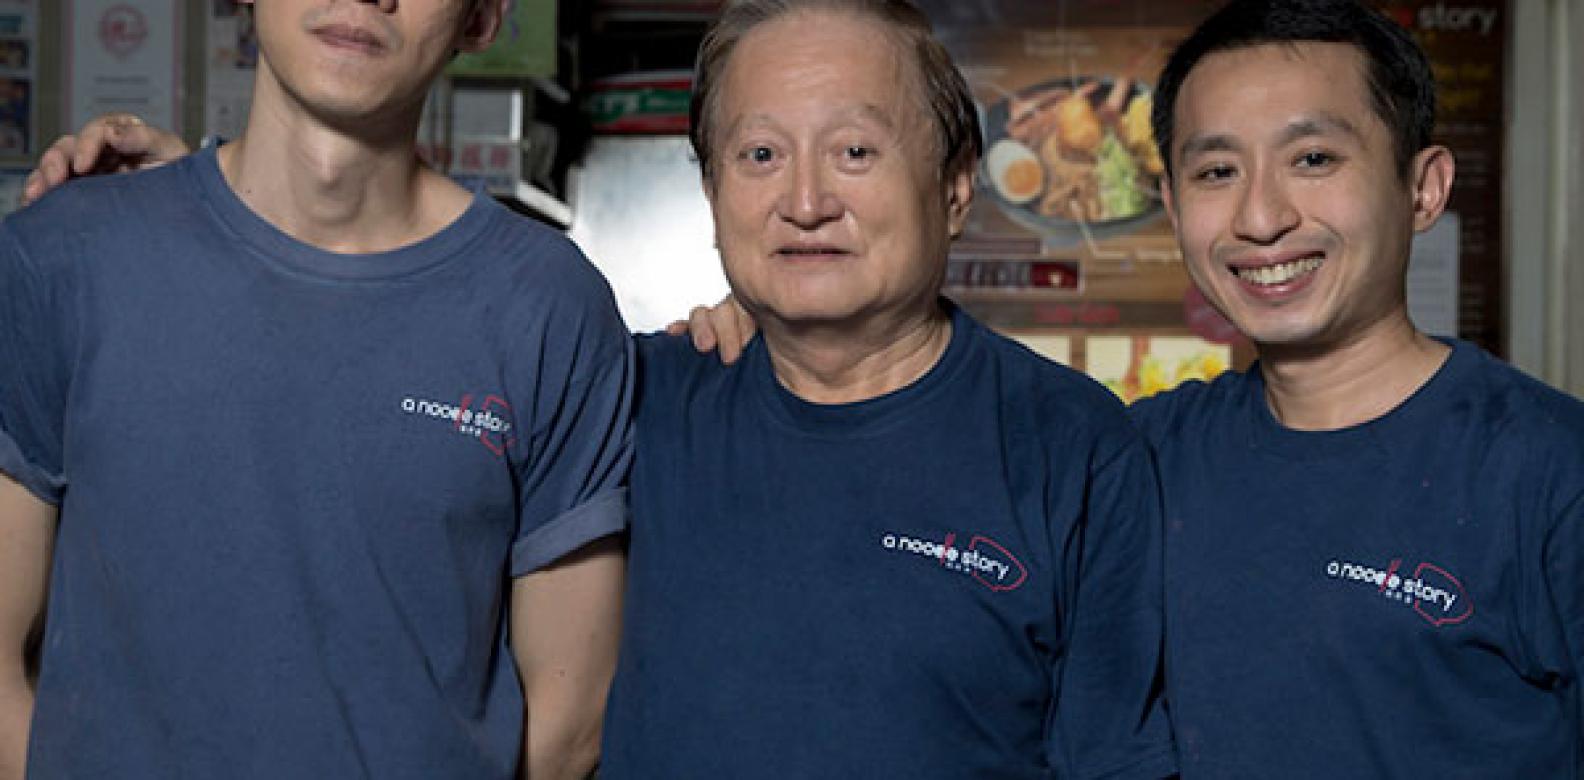 Favourite Street Food Vendor: A Noodle Story